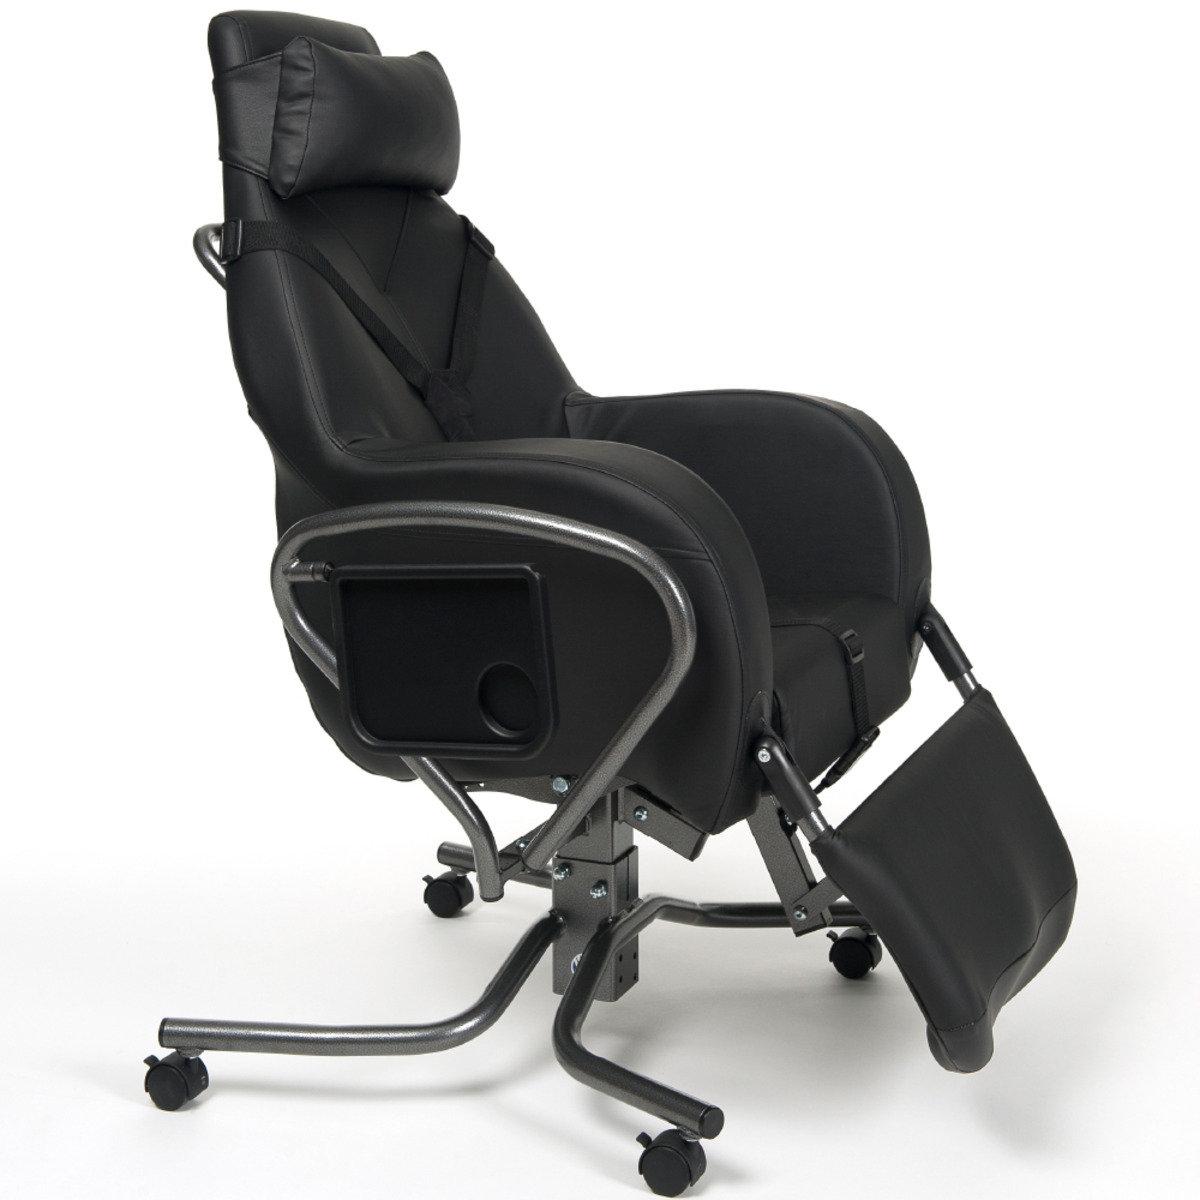 比利時 Charme Deluxe 有輪高背椅